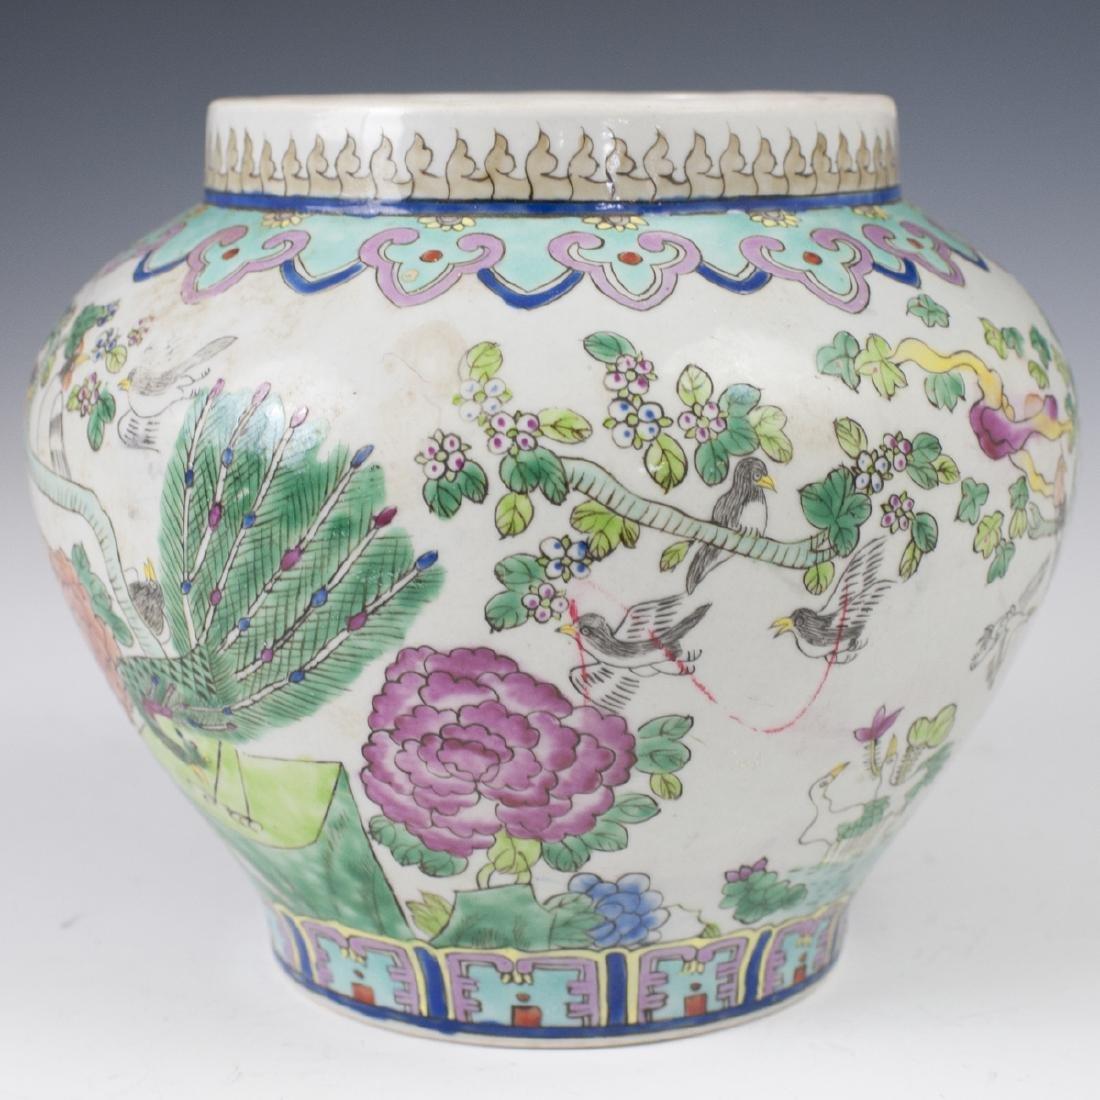 Chinese Famille Rose Porcelain Vase - 5